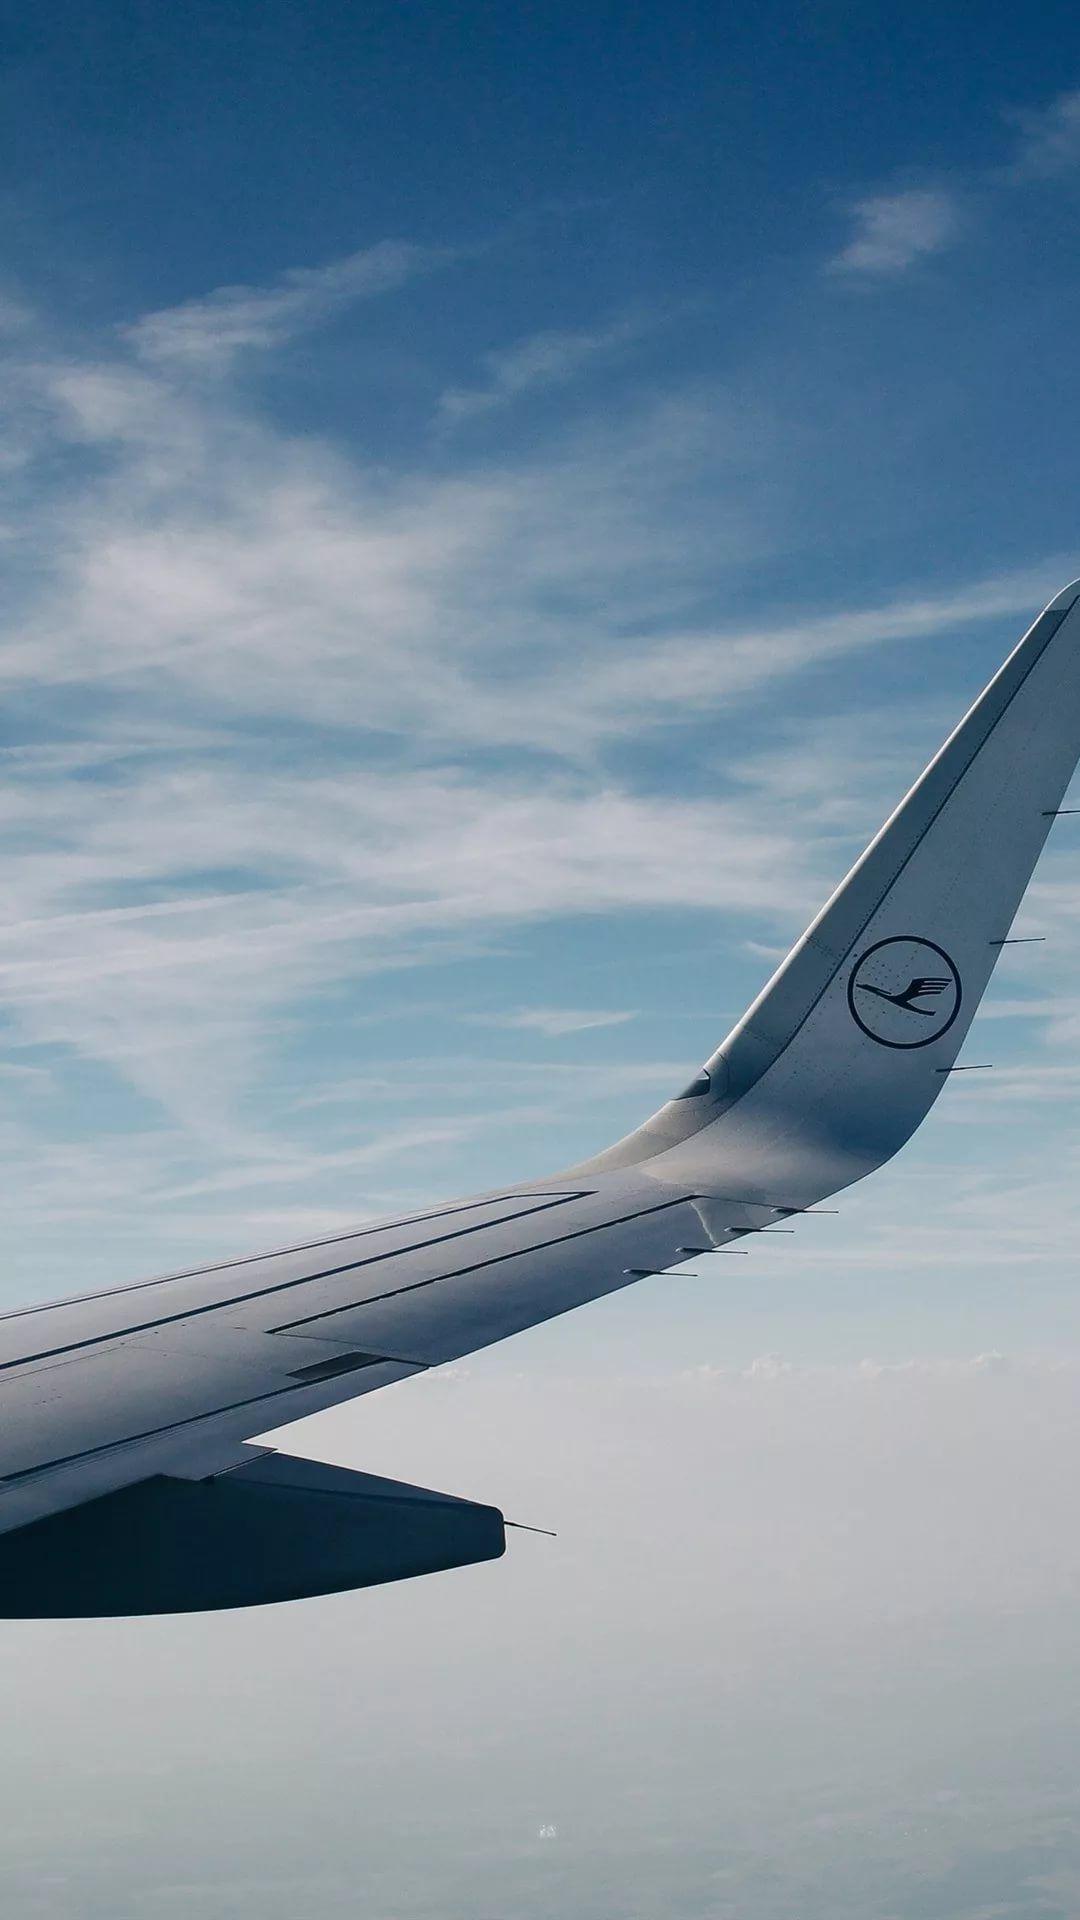 Airplane Galaxy s7 wallpaper